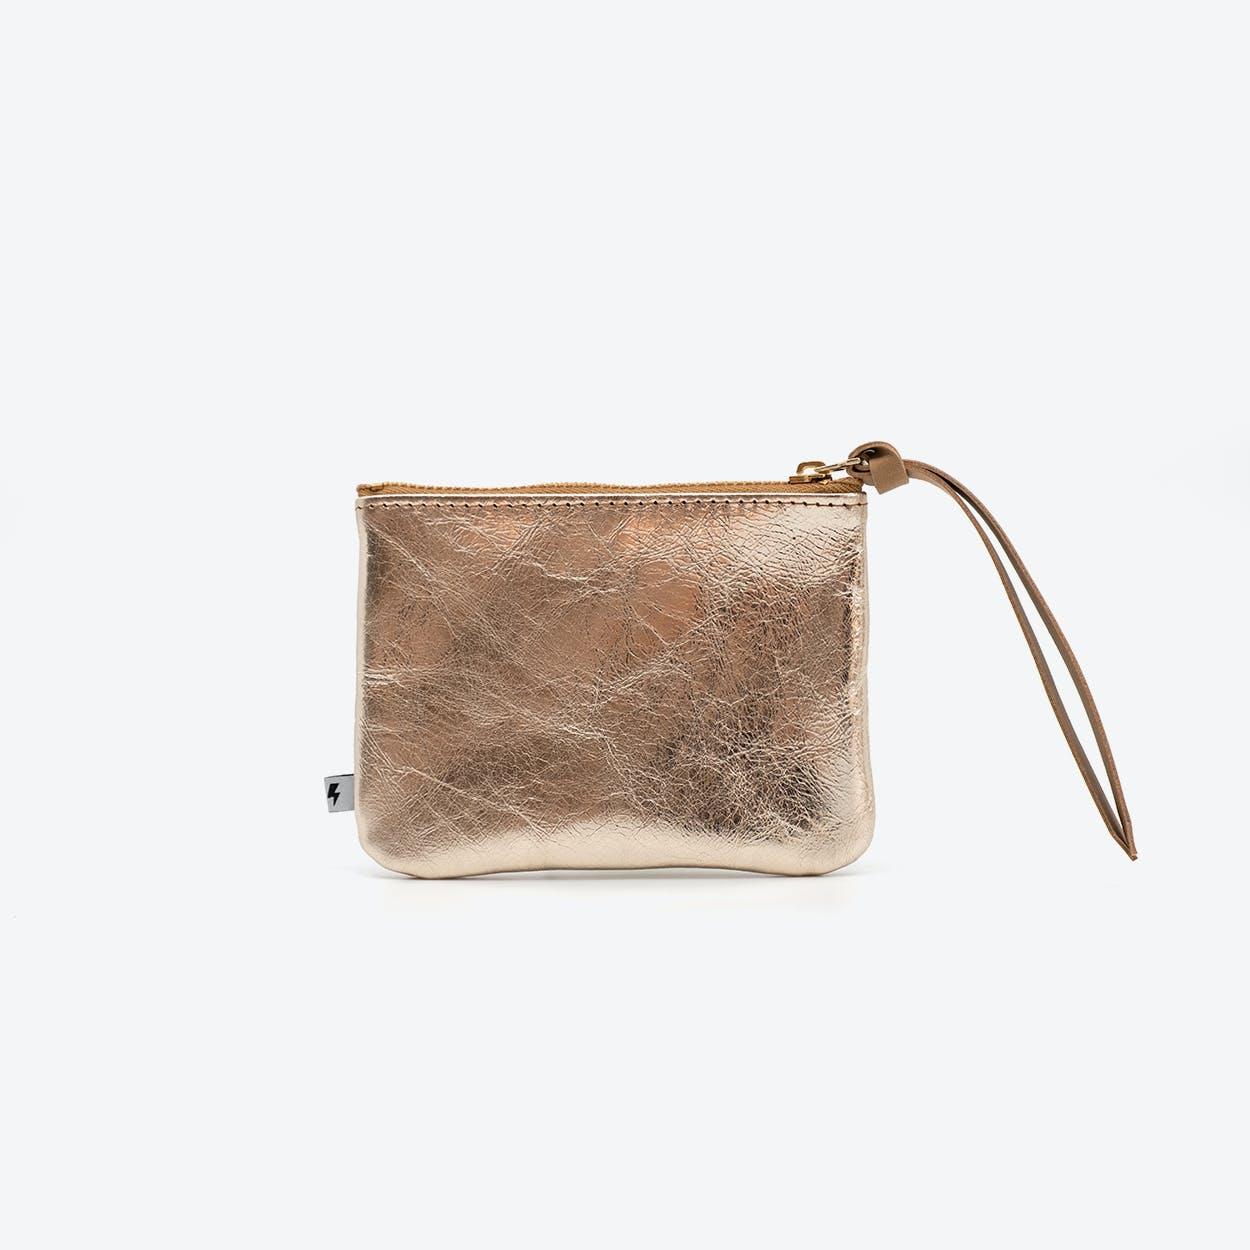 MAX Small Clutch in Brown / Copper